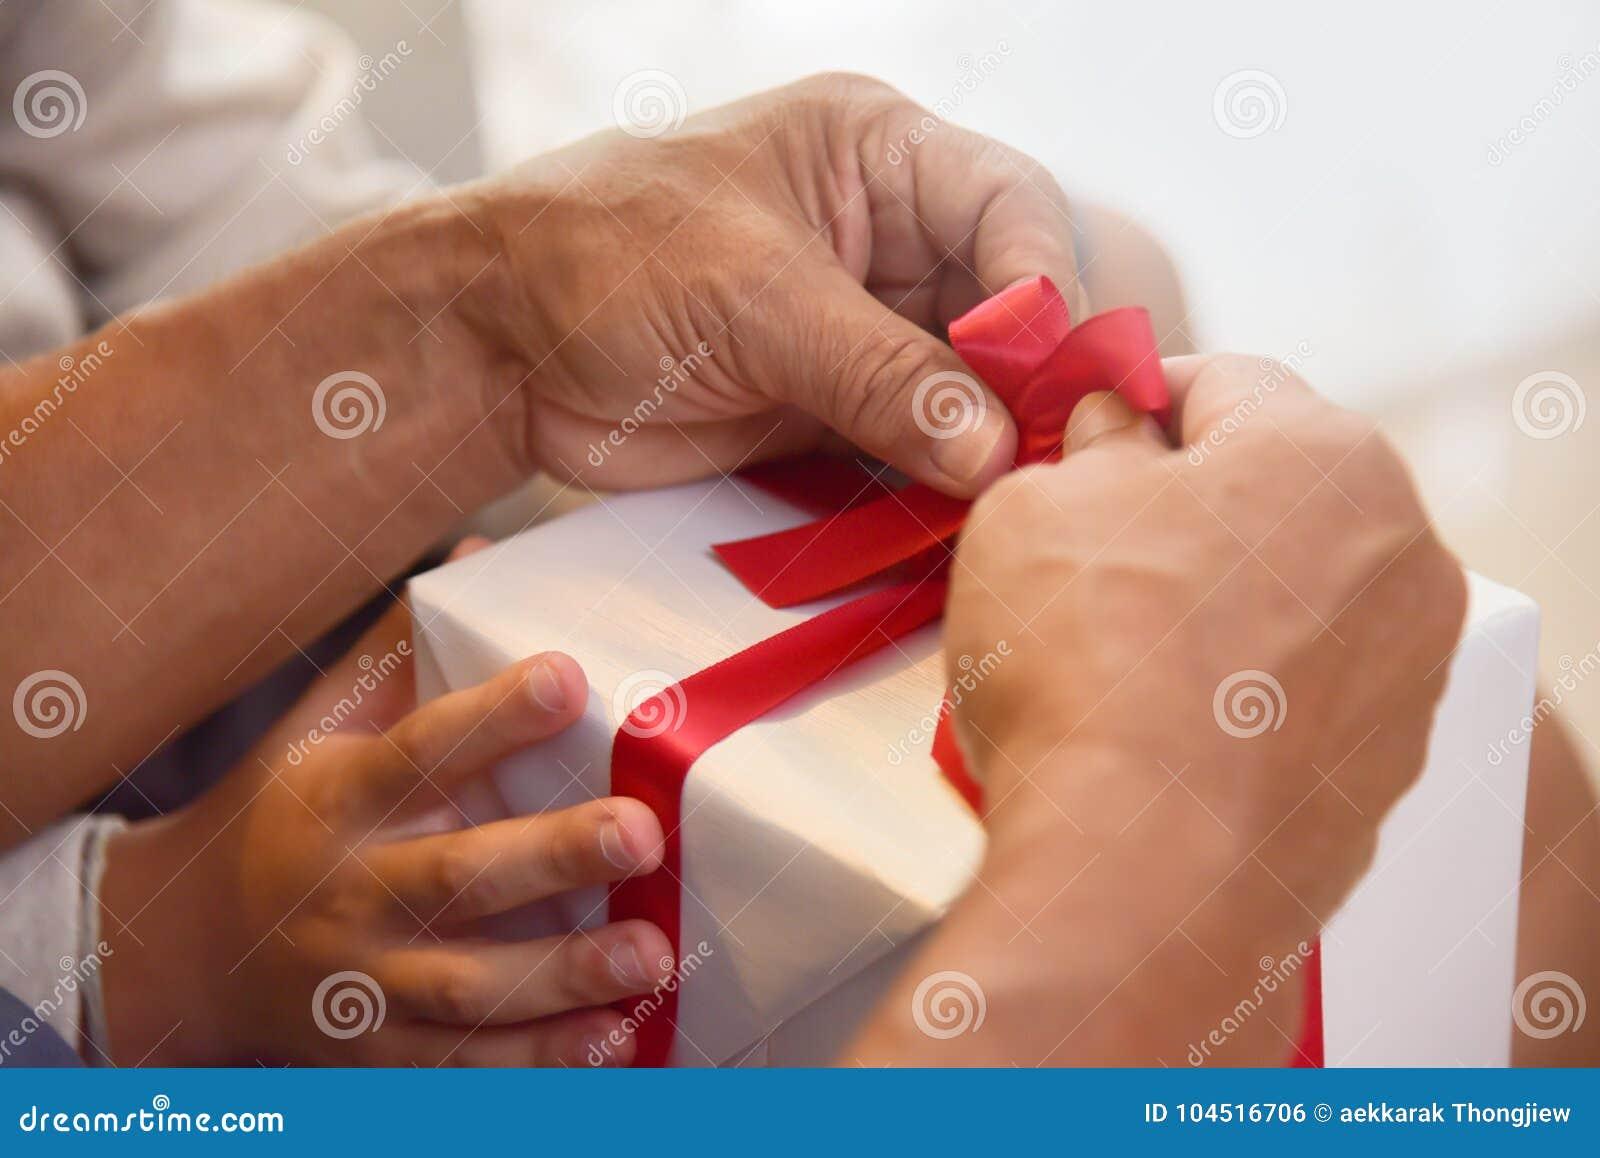 Asian Boy And Elderly Man Holding On Red Ribbon Of White Gift Bo